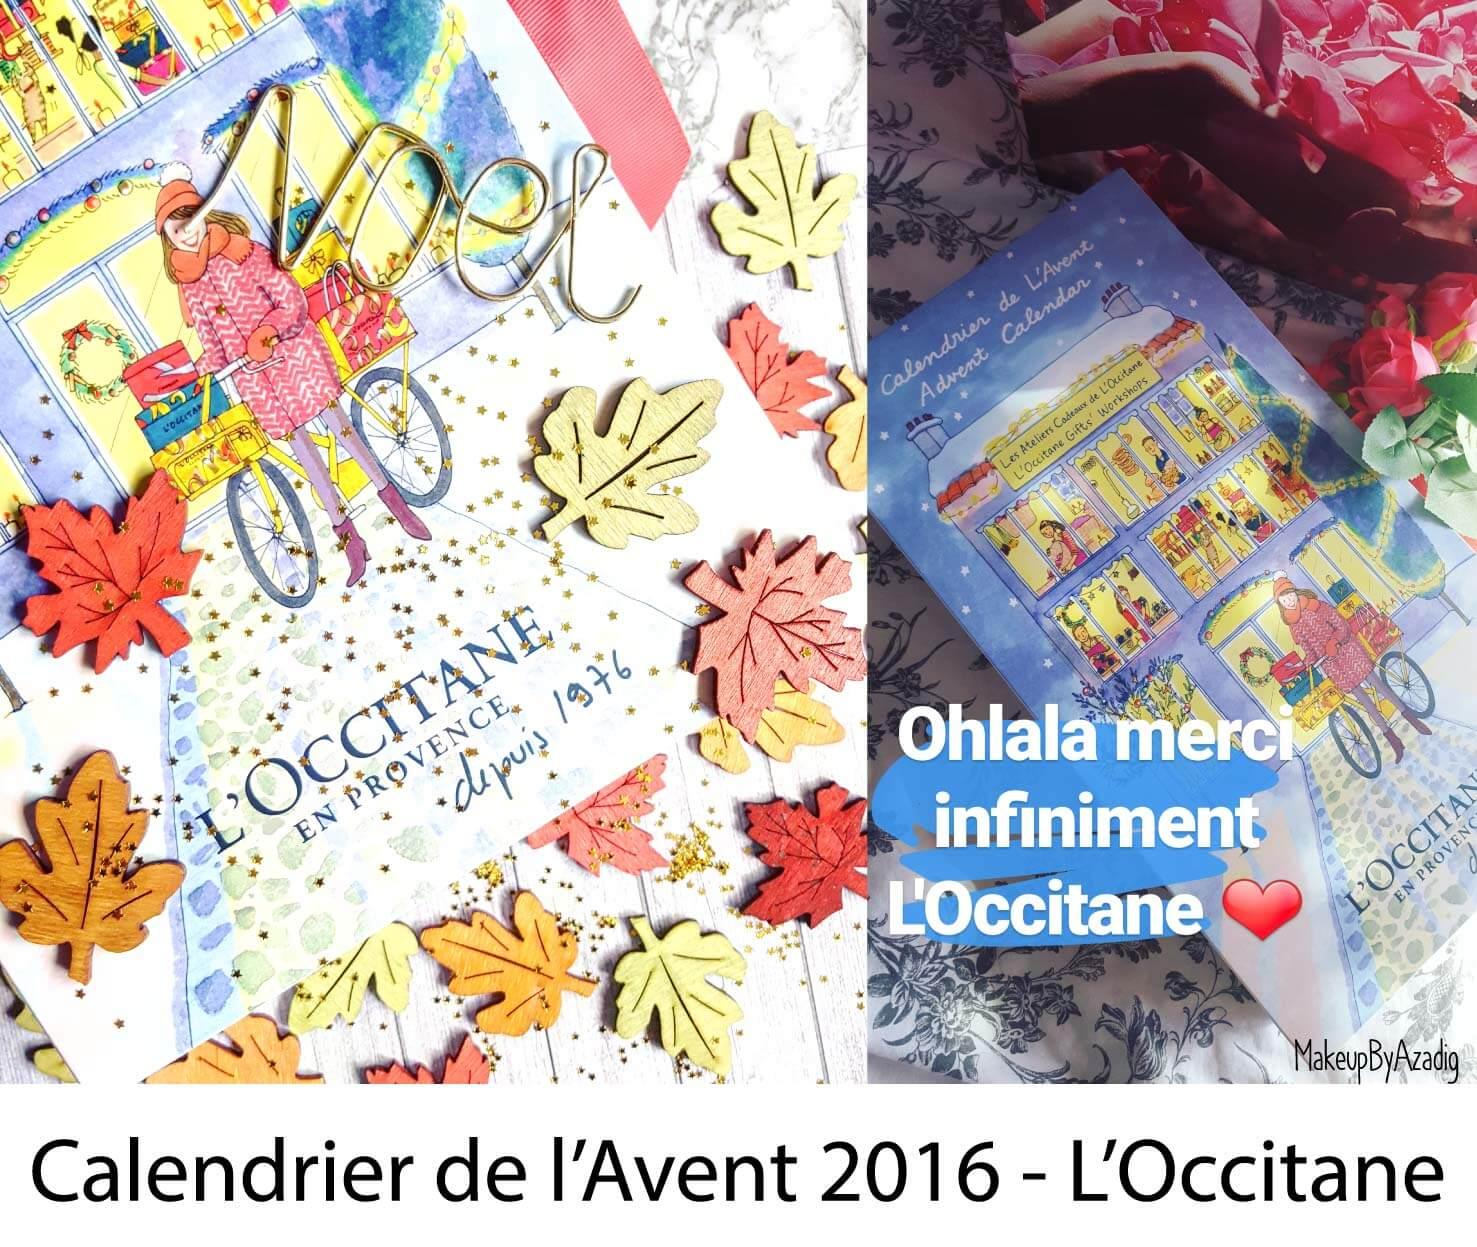 Calendrier De L Avant Occitane.Calendrier De L Avent L Occitane 2017 Reservation